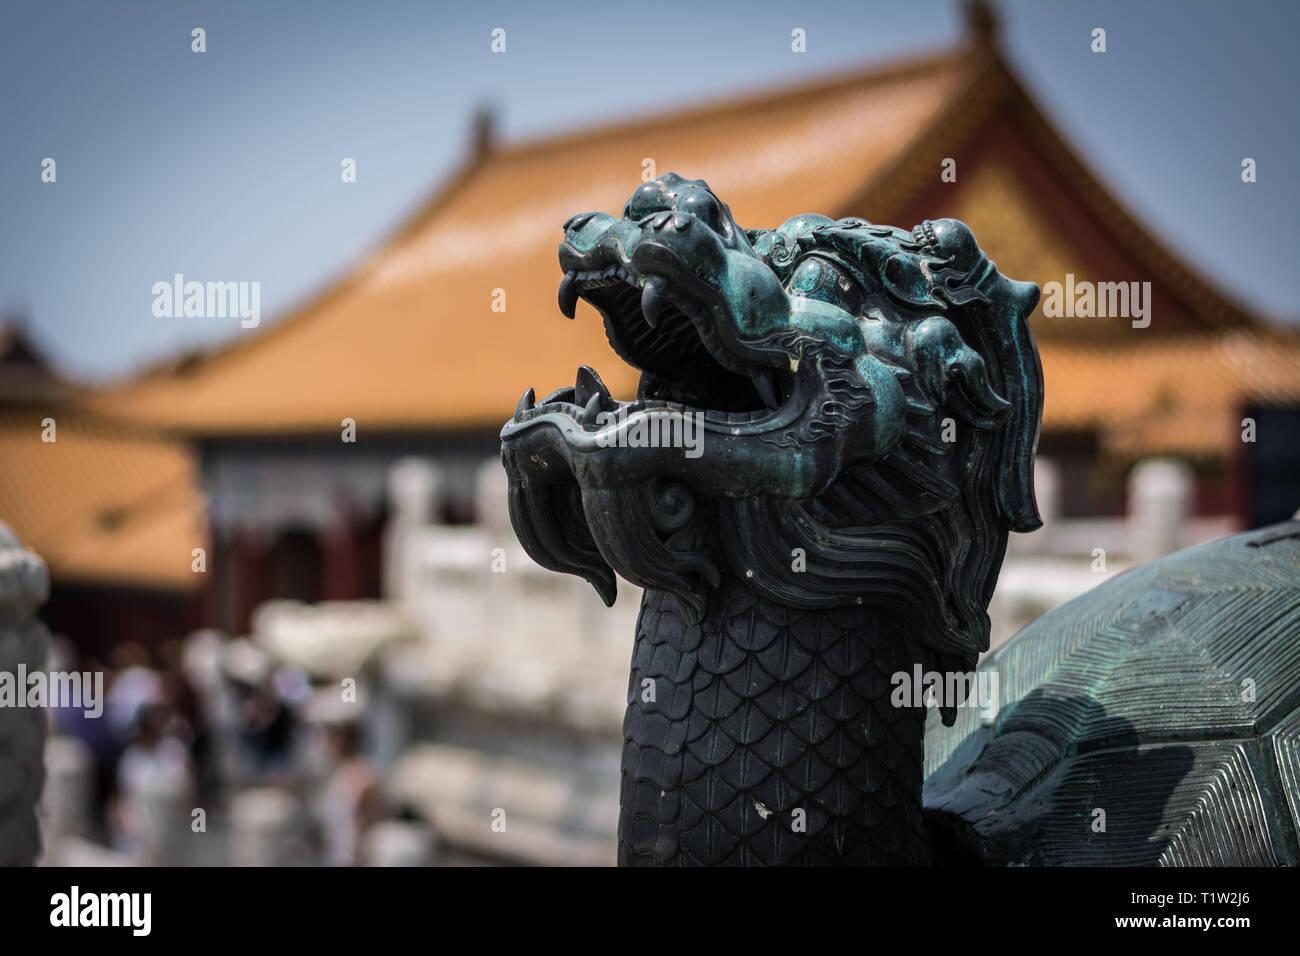 Inside the Forbidden City in Beijing - Stock Image